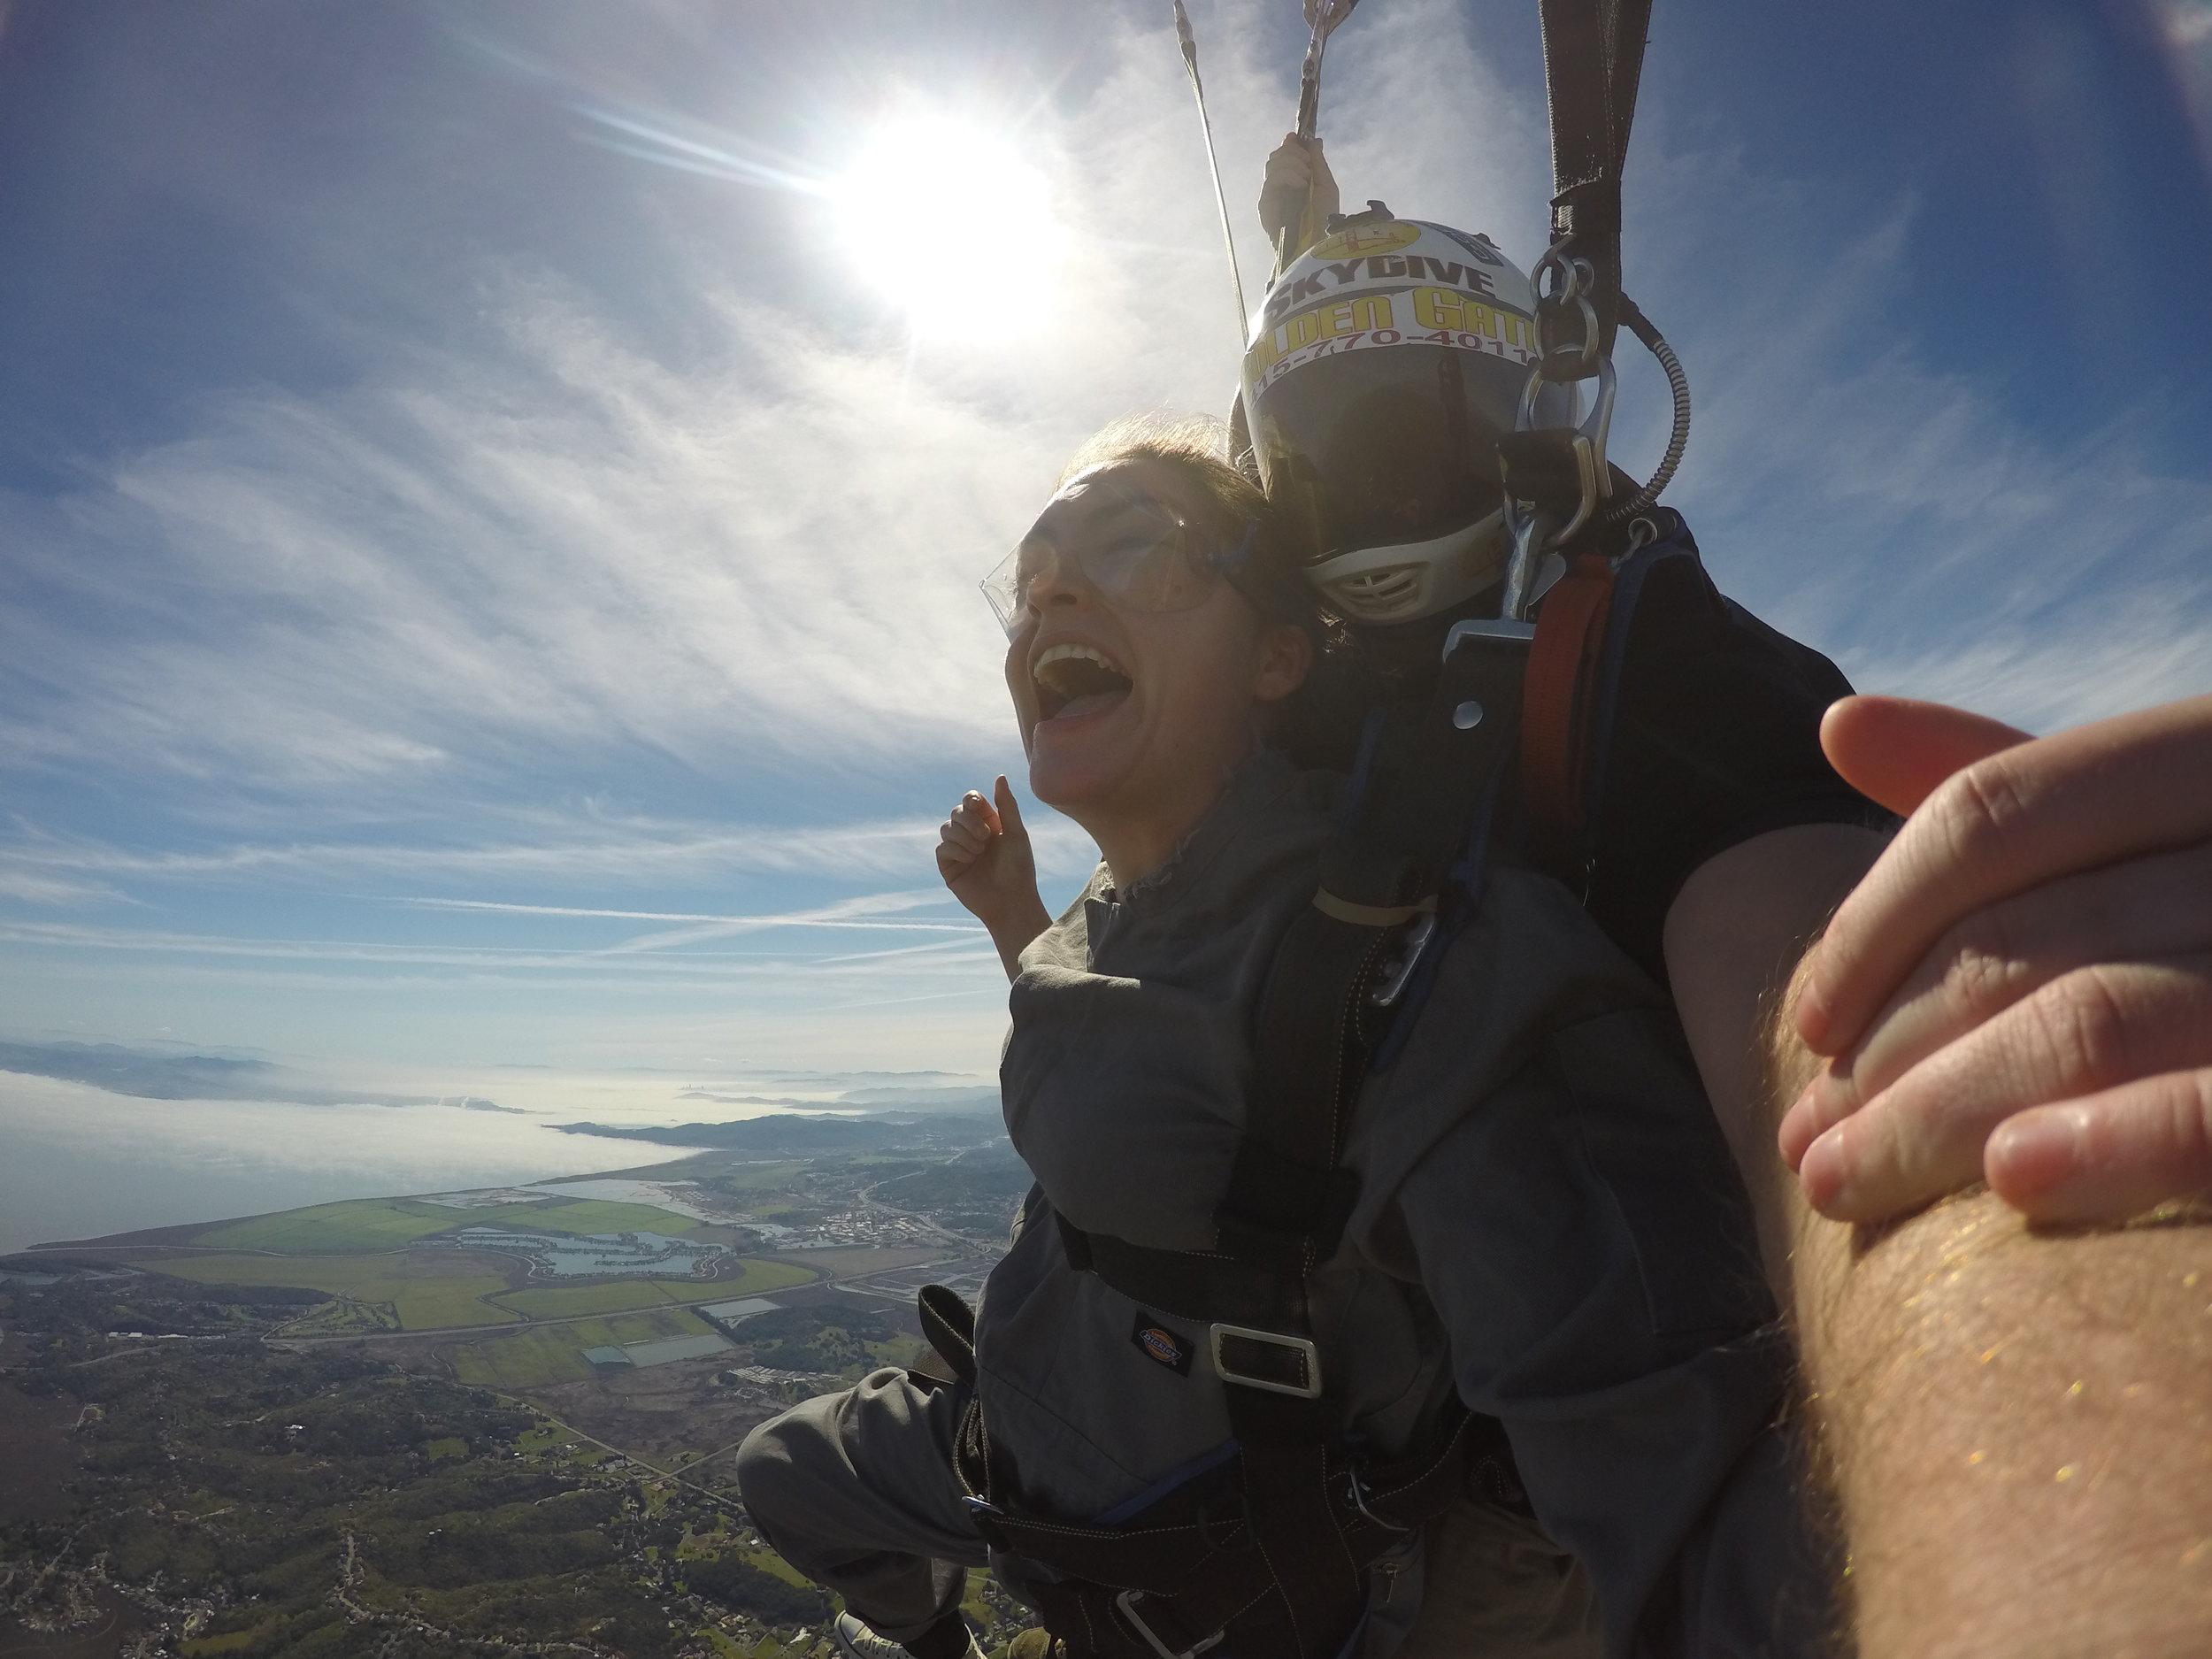 Skydive San Francisco